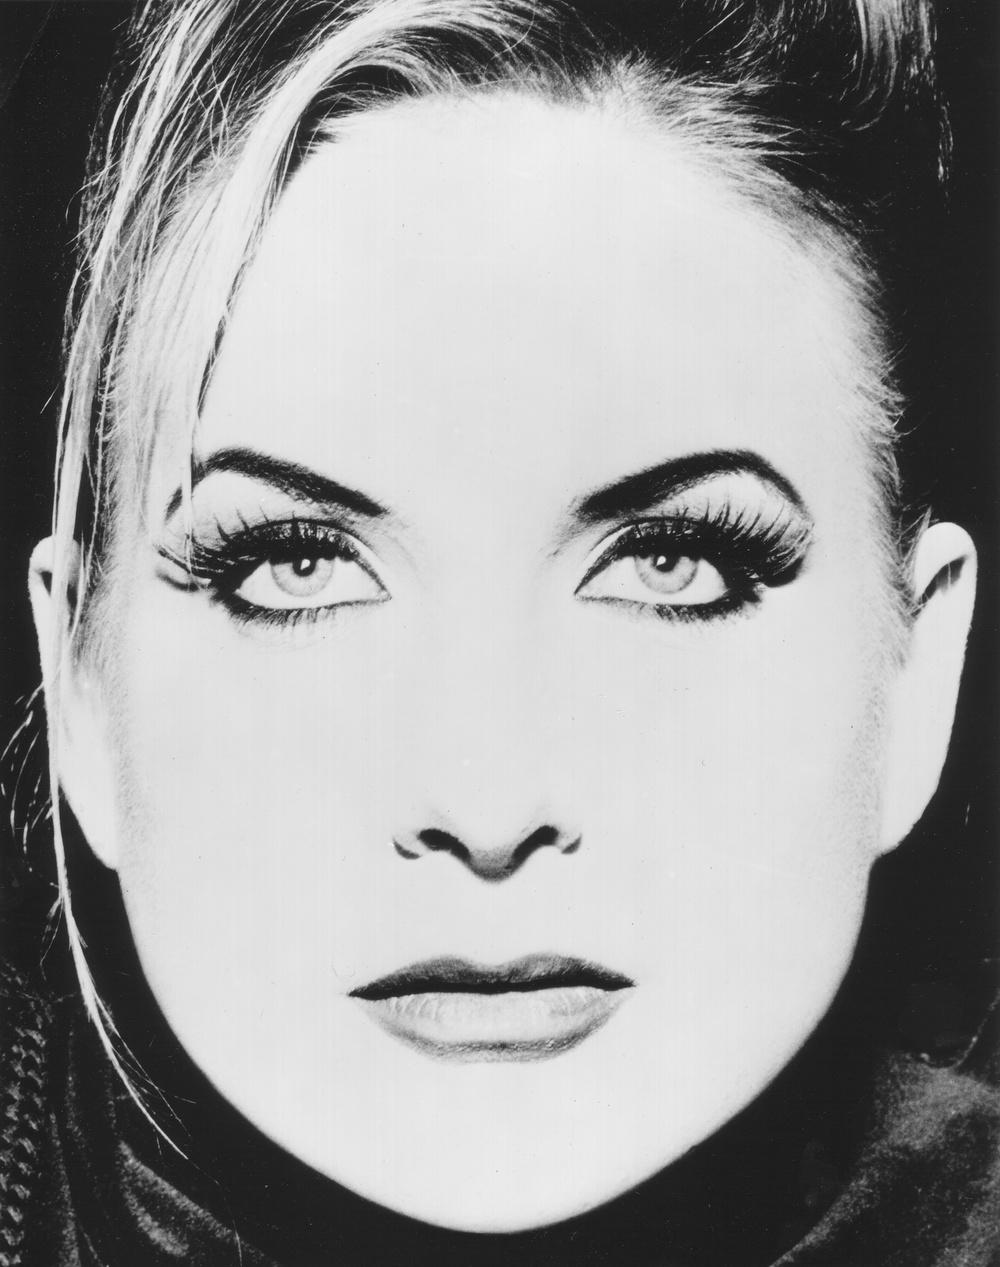 Lexi Picard Headshot (NYC 1994).jpg